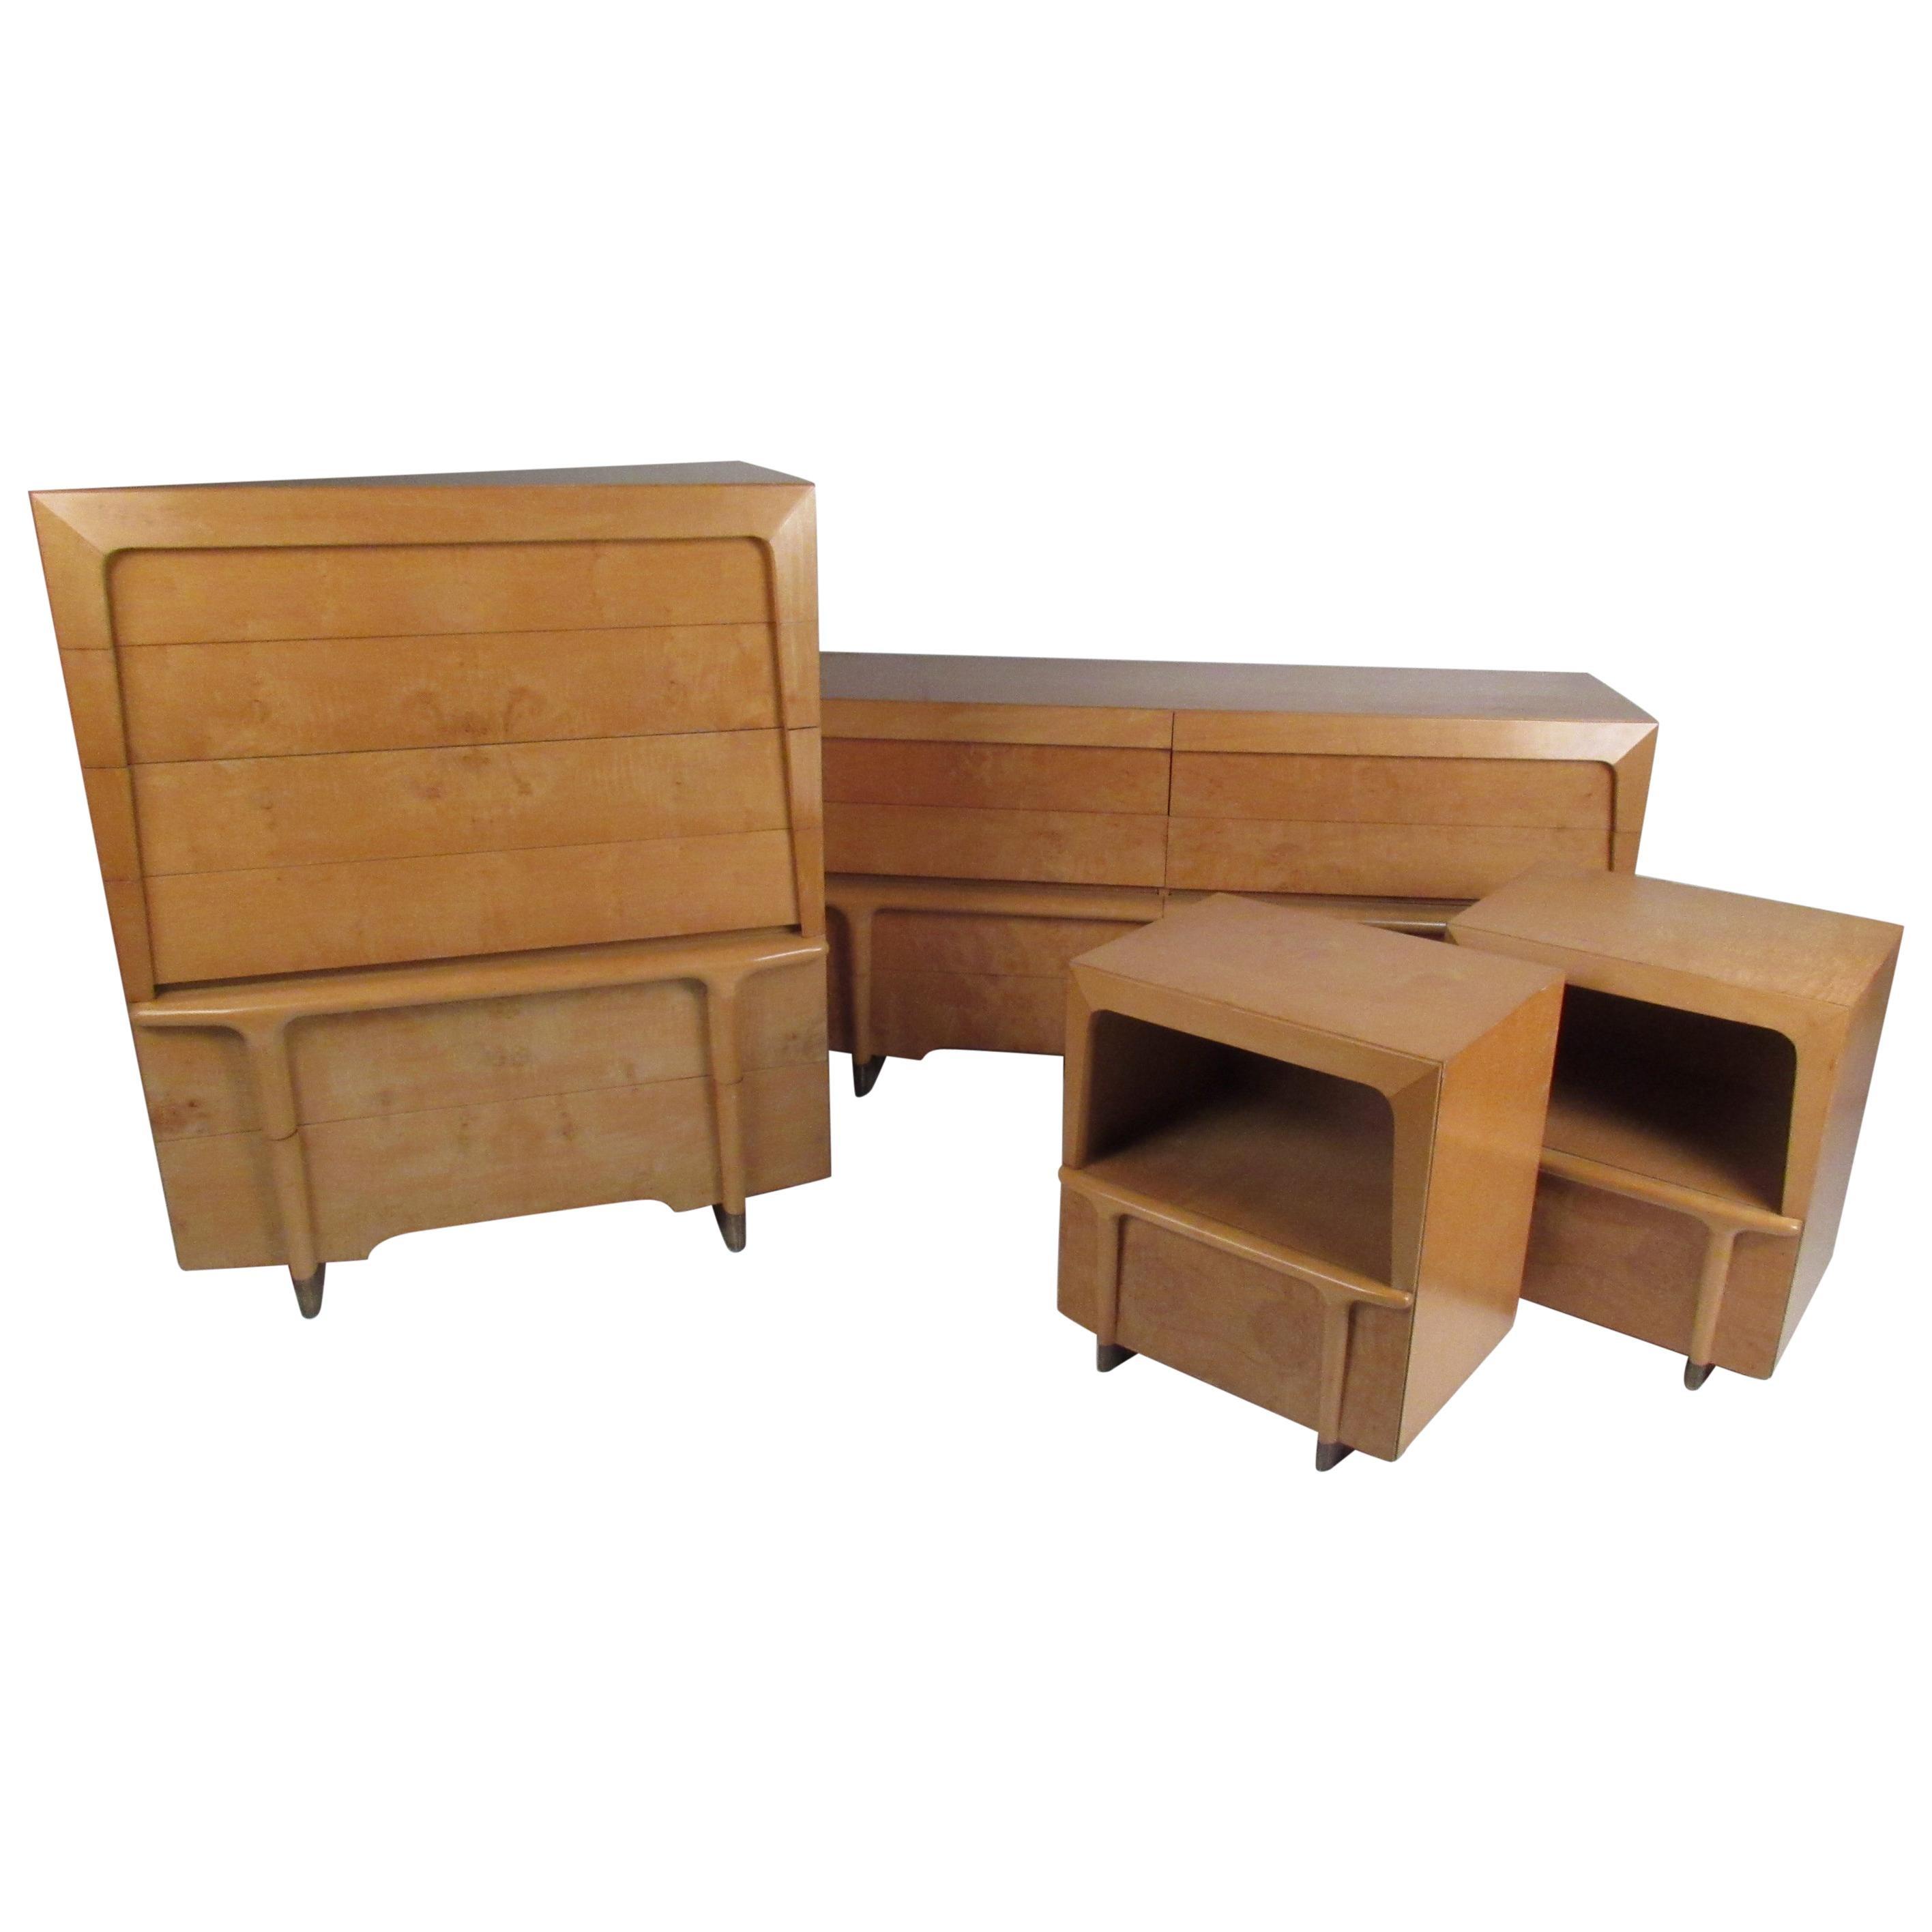 Mid-Century Modern Burl Maple Bedroom Set in the Style of Heywood Wakefield